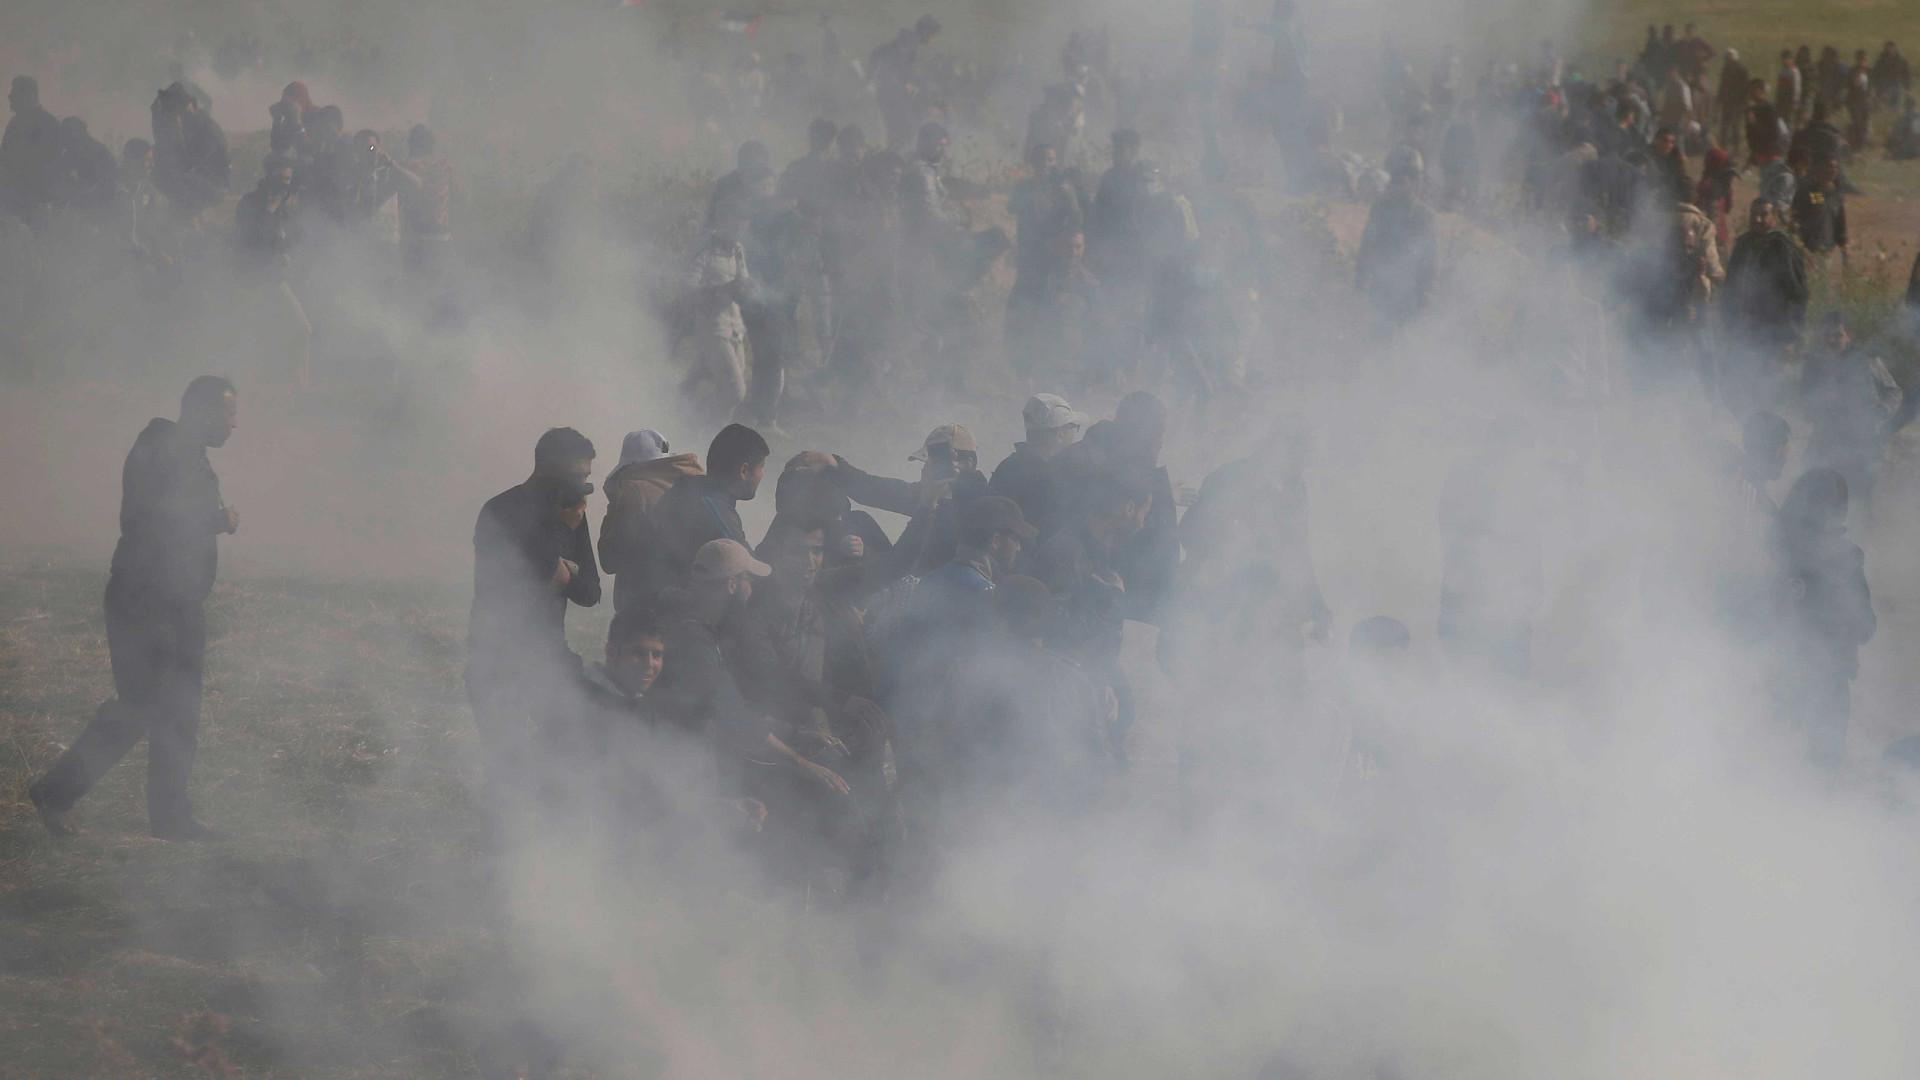 Conflito na fronteira entre Israel e Gaza mata 15 e fere mil palestinos